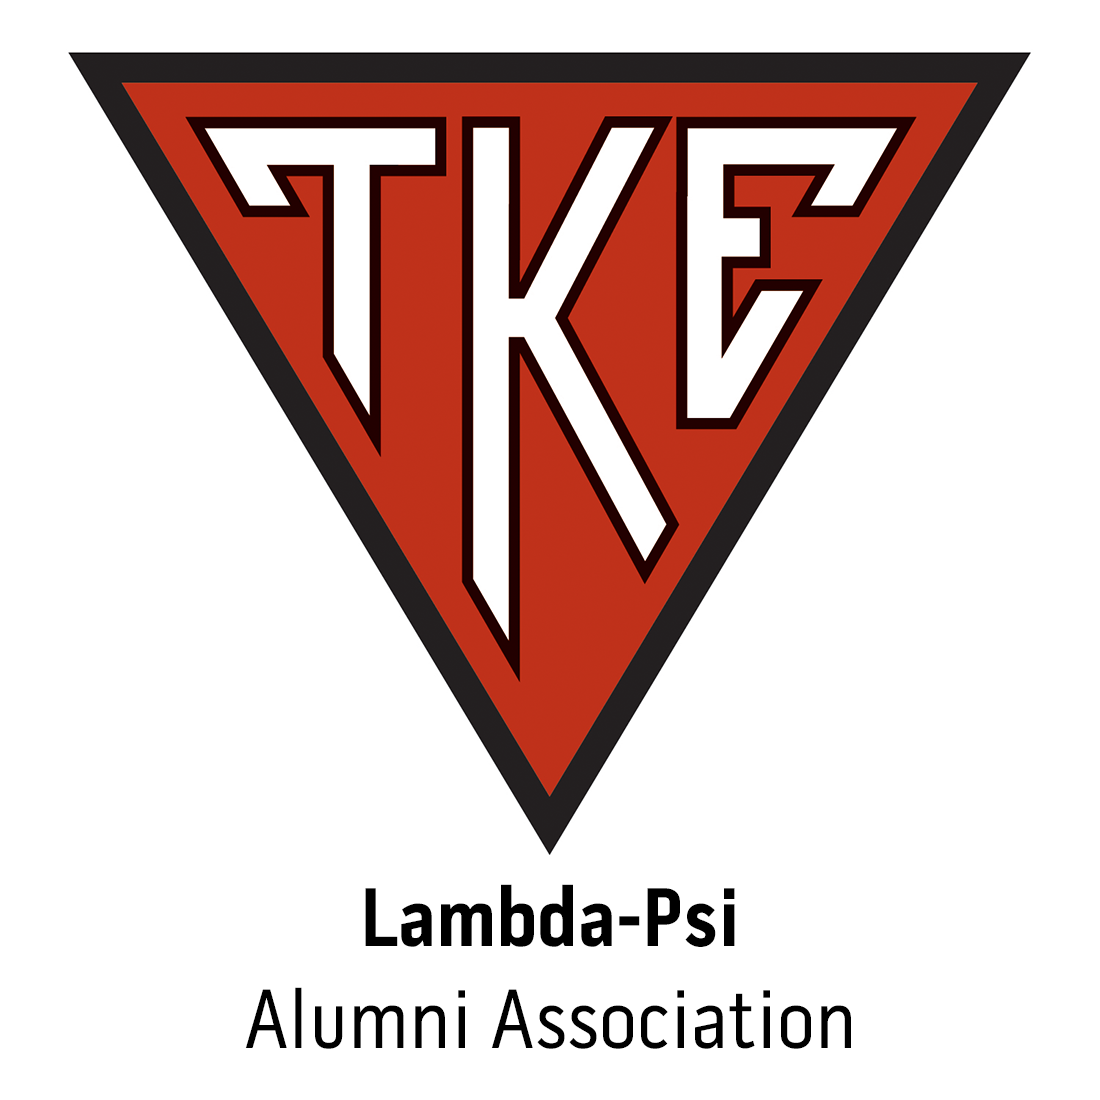 Lambda-Psi Alumni Association Alumni at East Carolina University